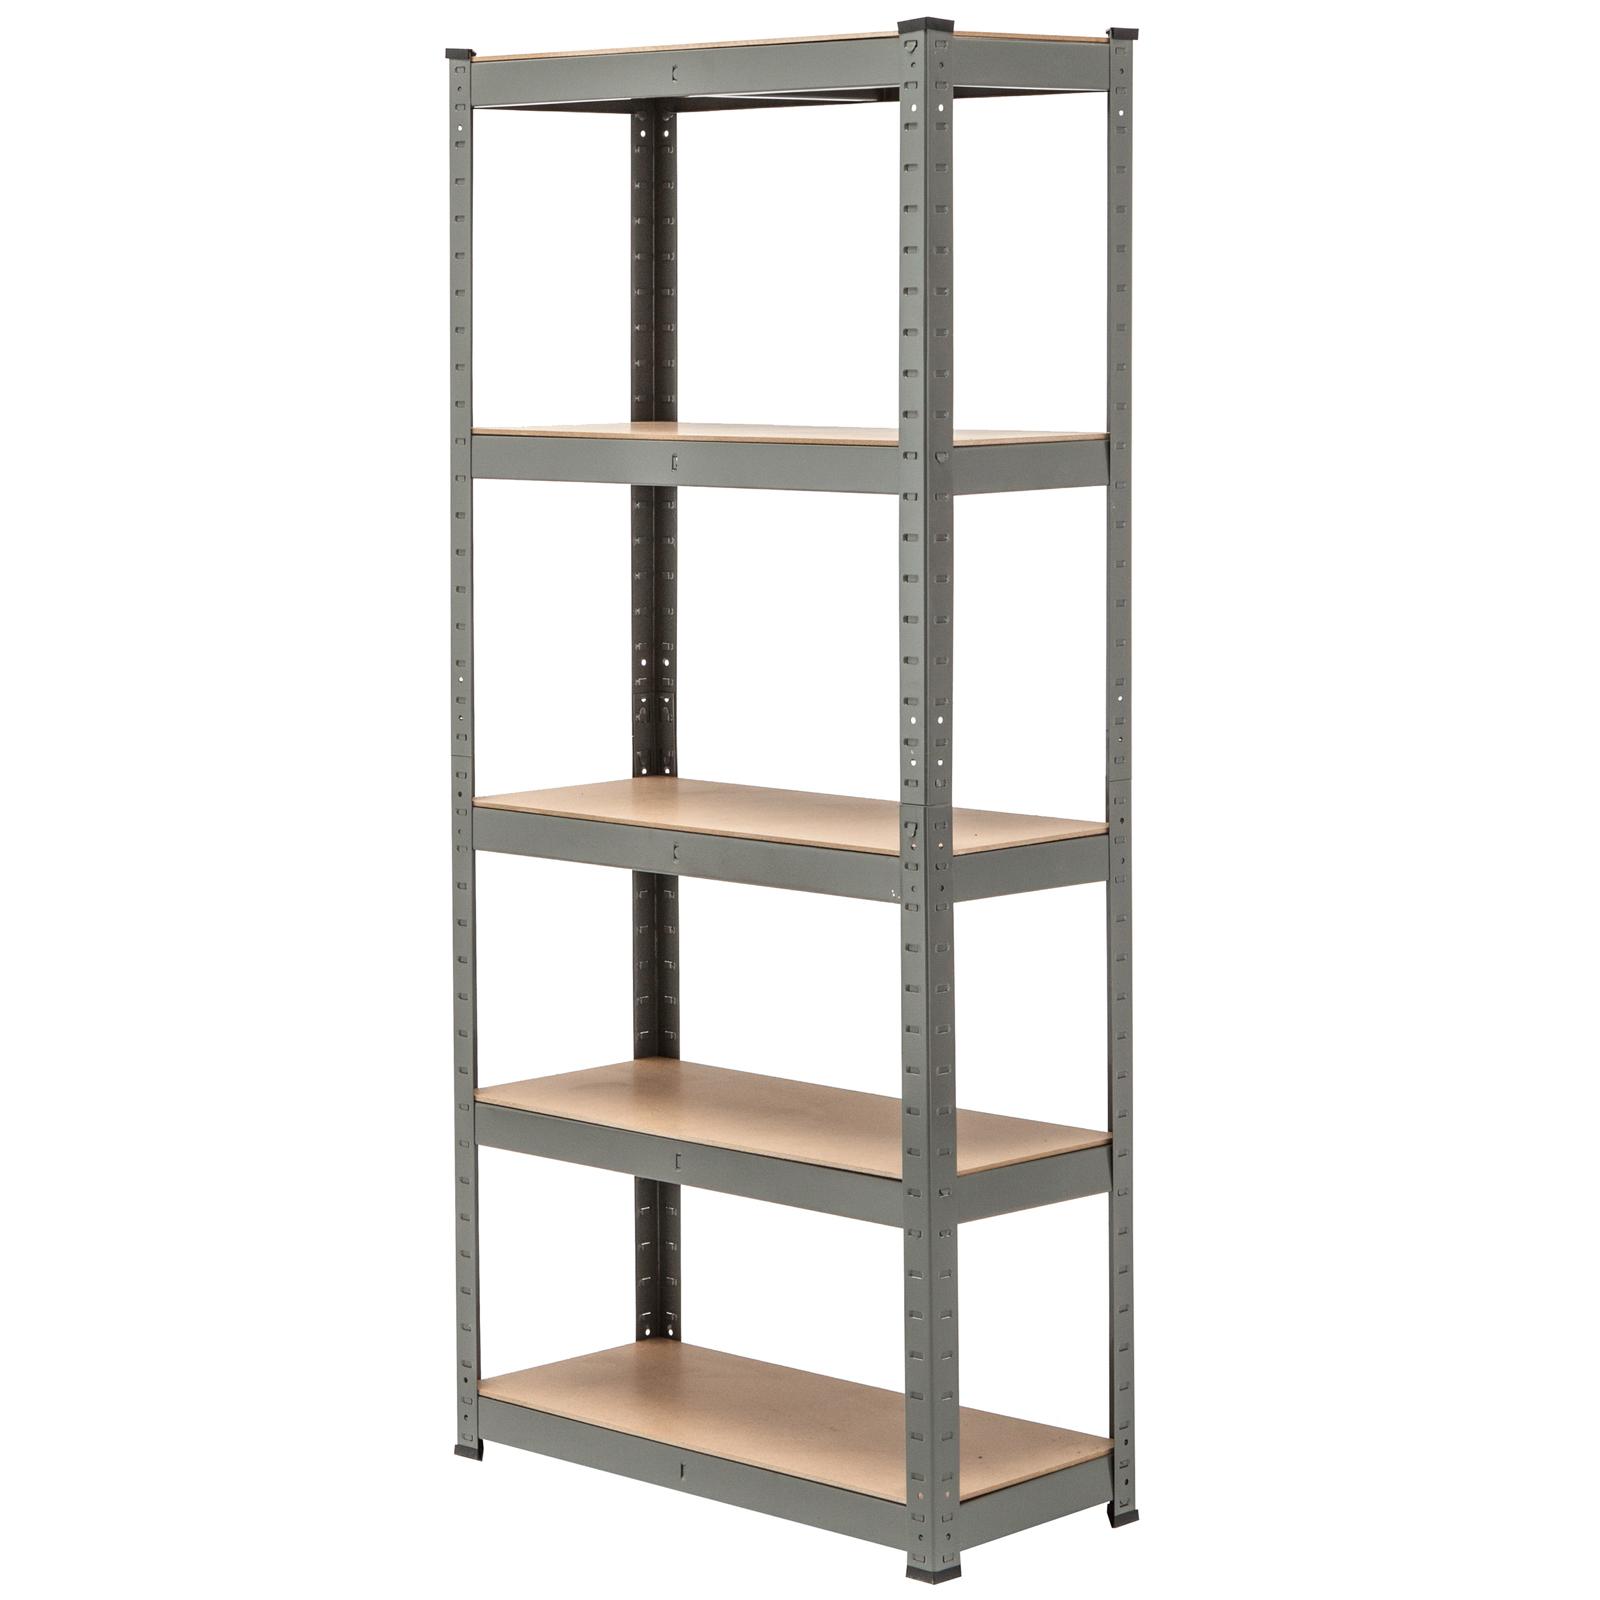 5 tier heavy duty boltless metal grey shelving storage. Black Bedroom Furniture Sets. Home Design Ideas